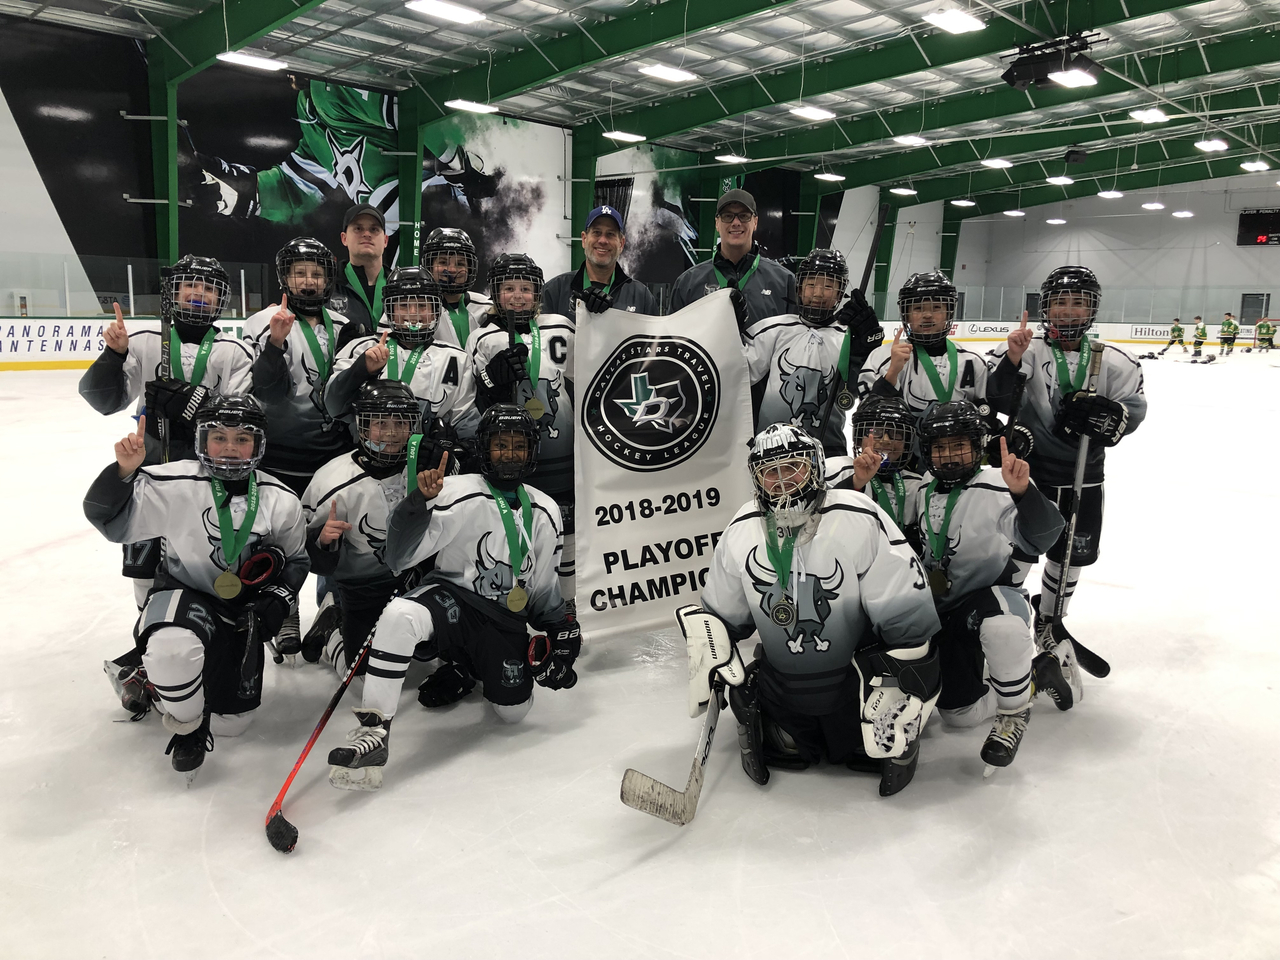 2019 Dsthl 10u A Playoff Champions Dallas Stars Travel Hockey League